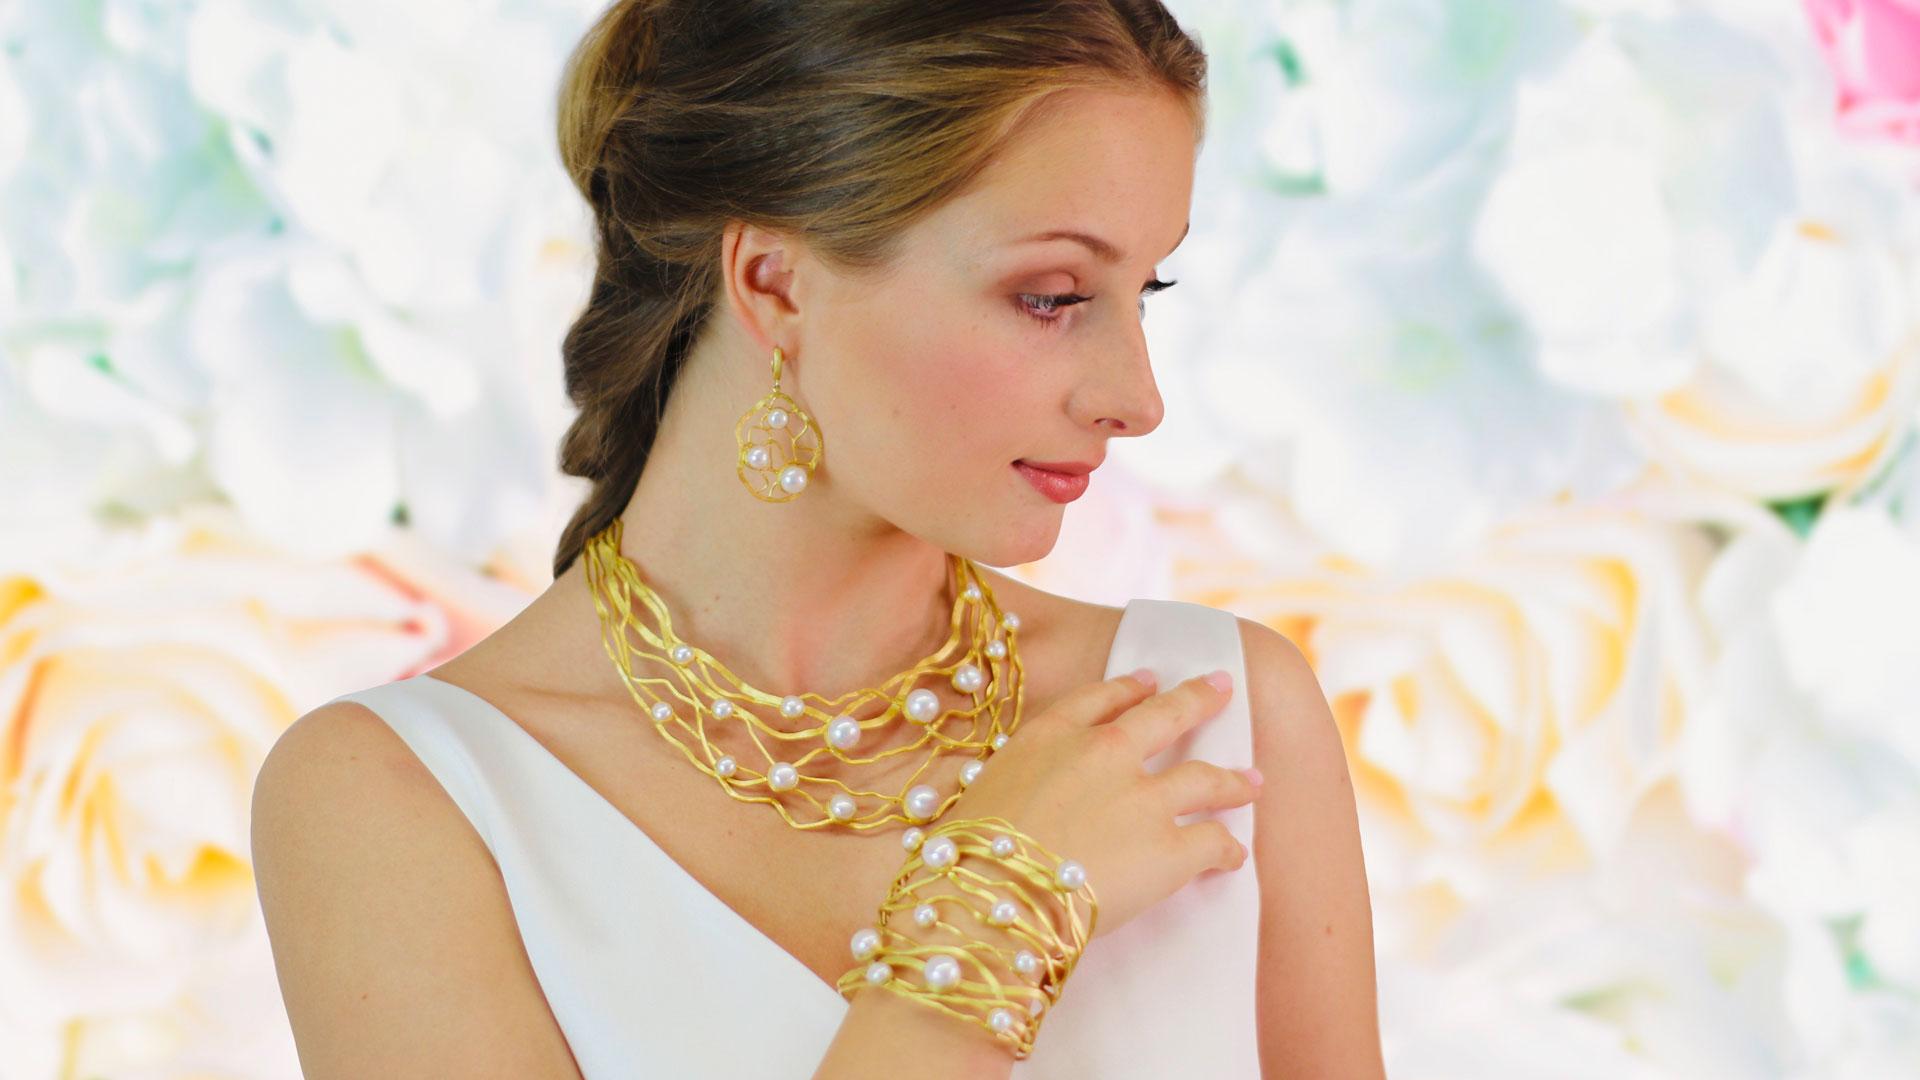 Goldene Halskette und goldener Ring